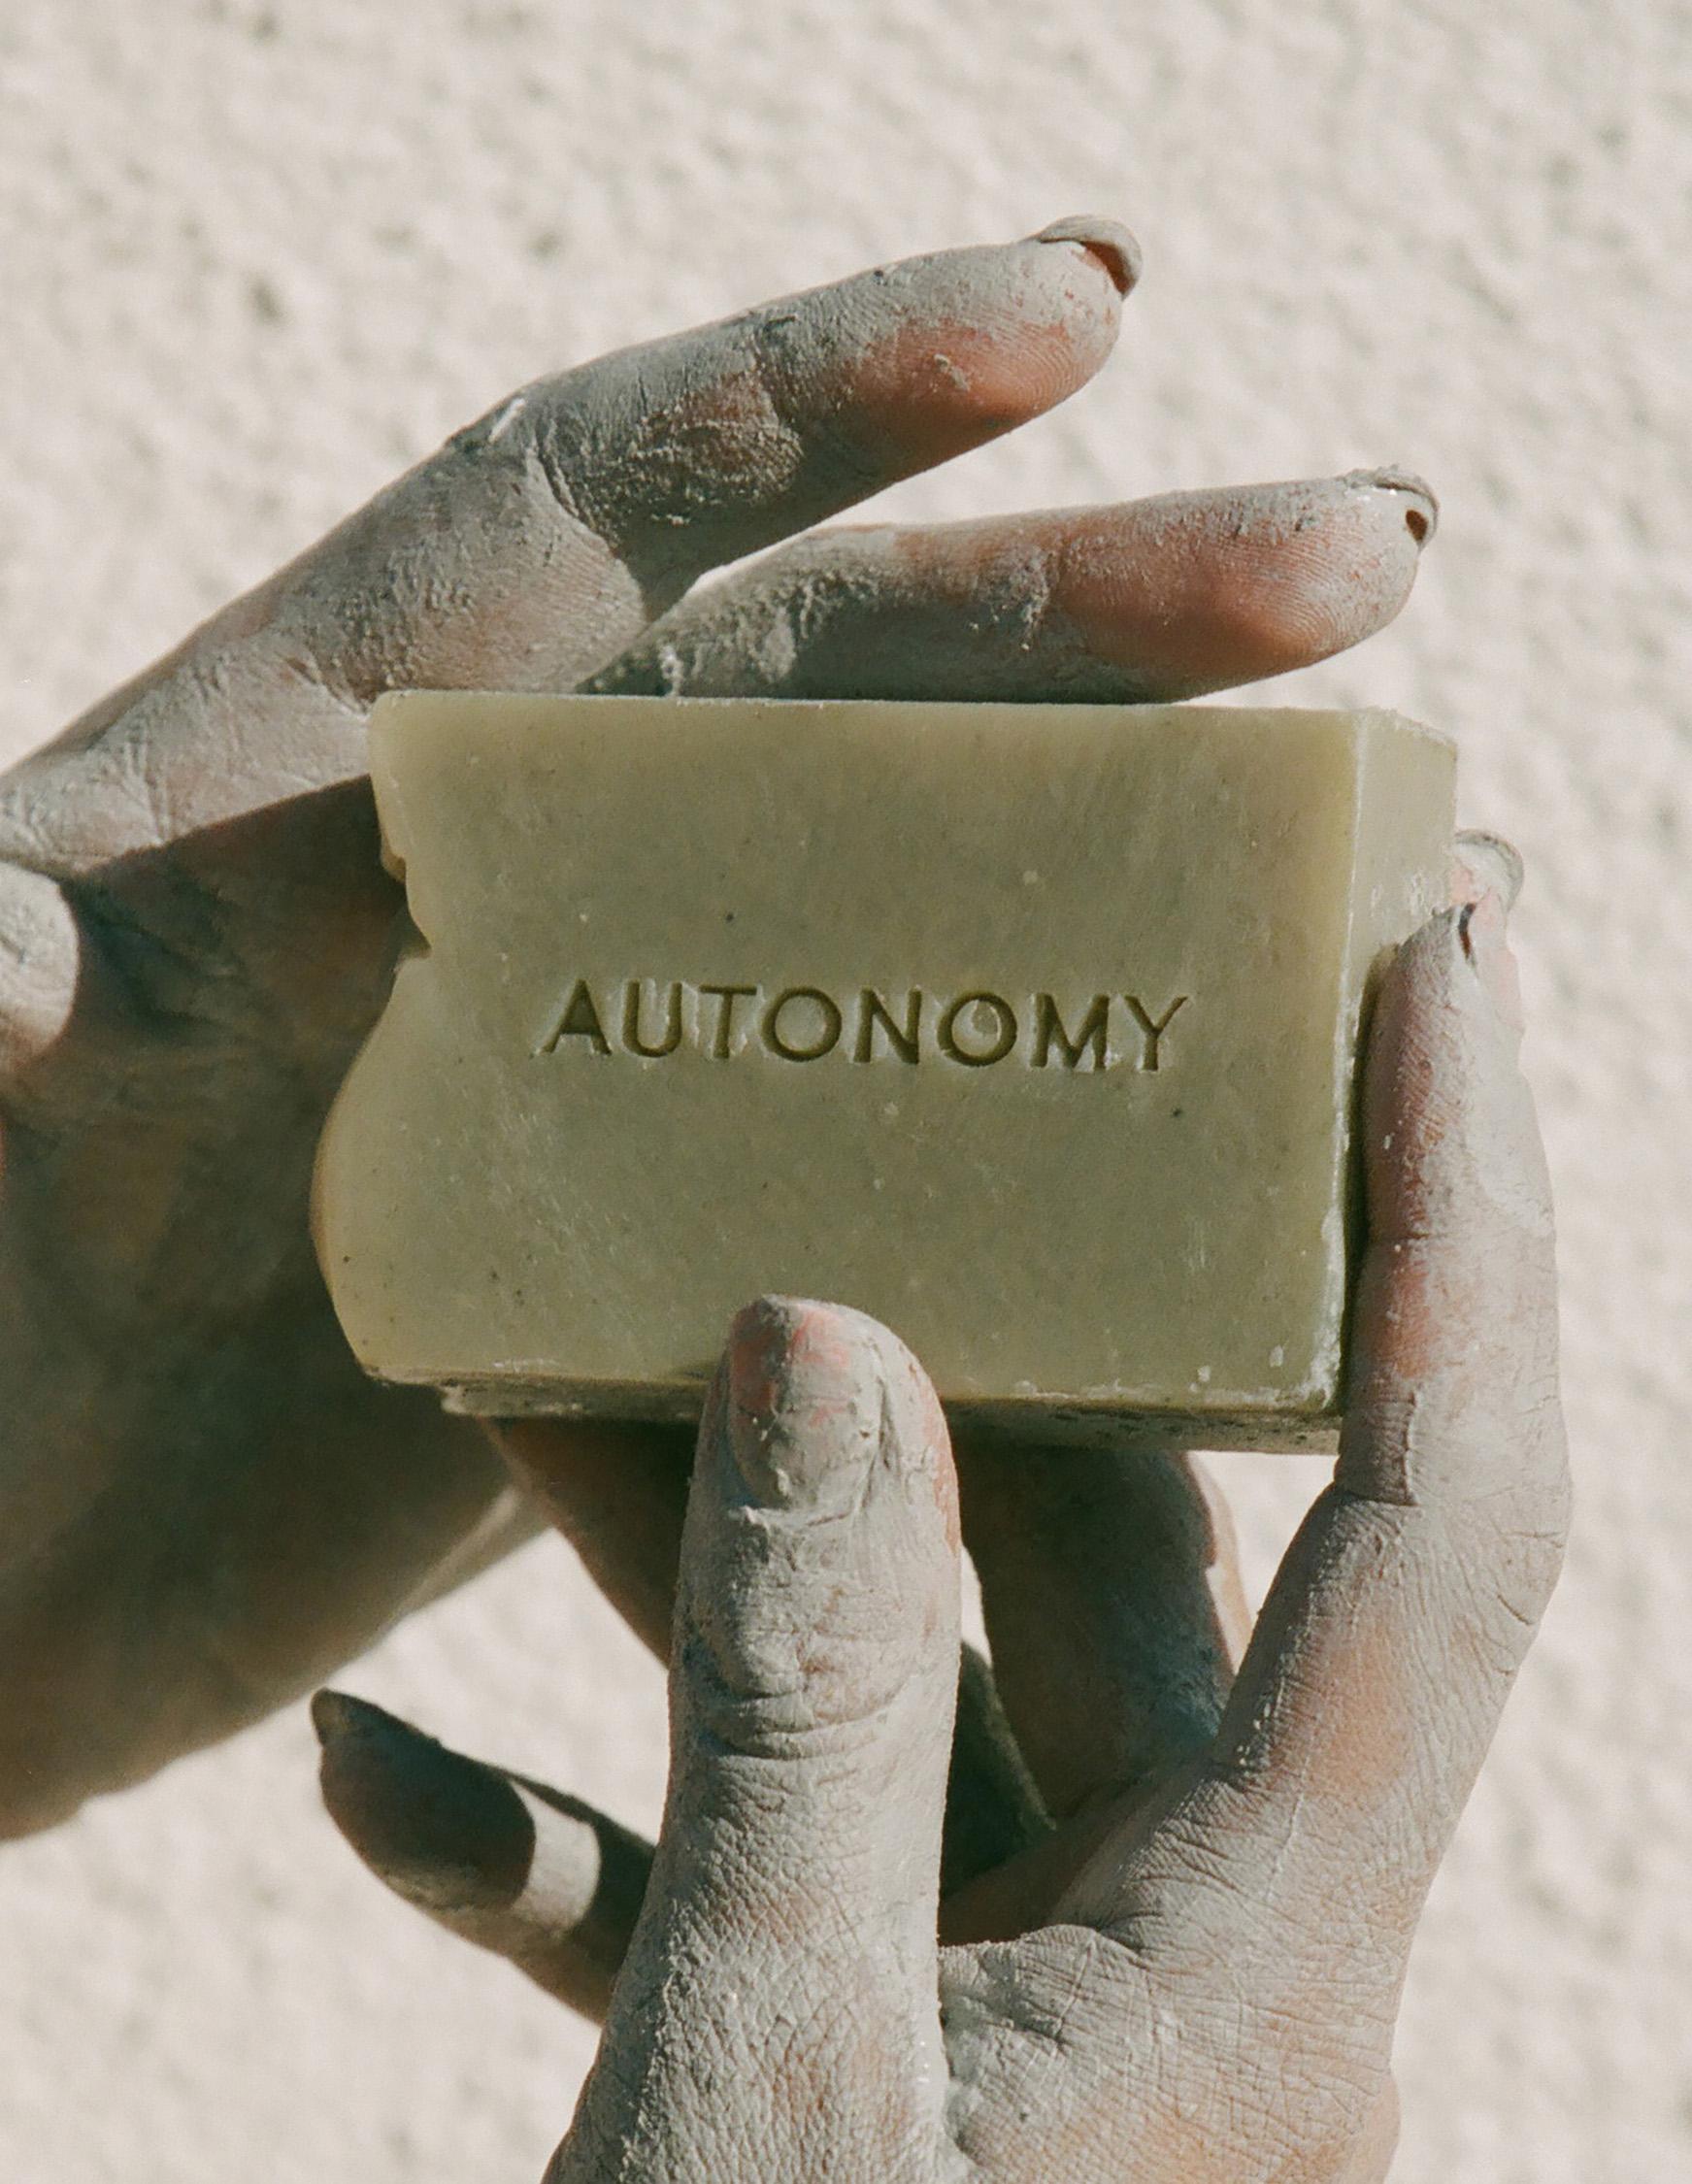 autonomy soap closeup